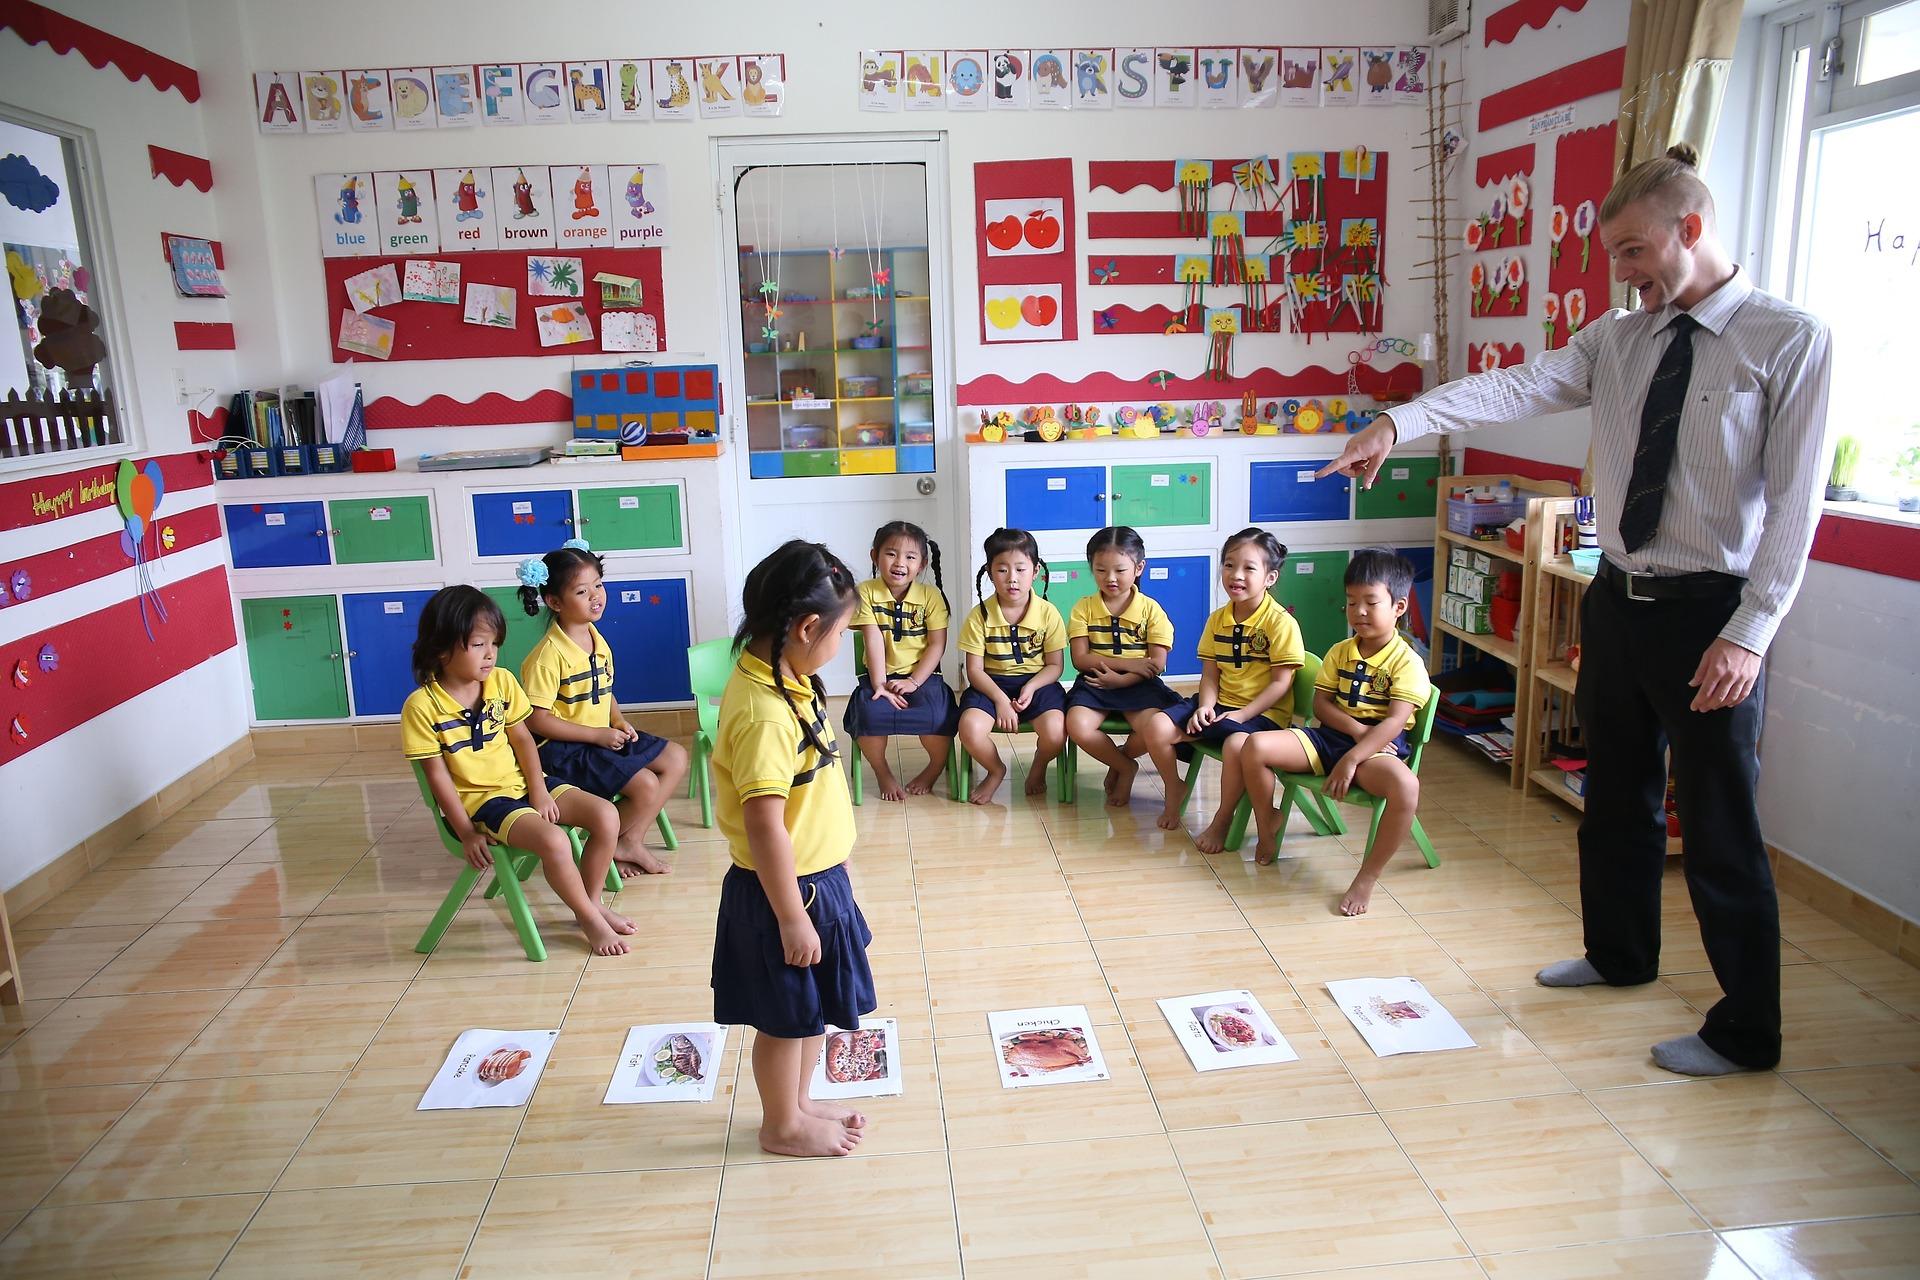 federal report recommends schools teach self-regulation skills